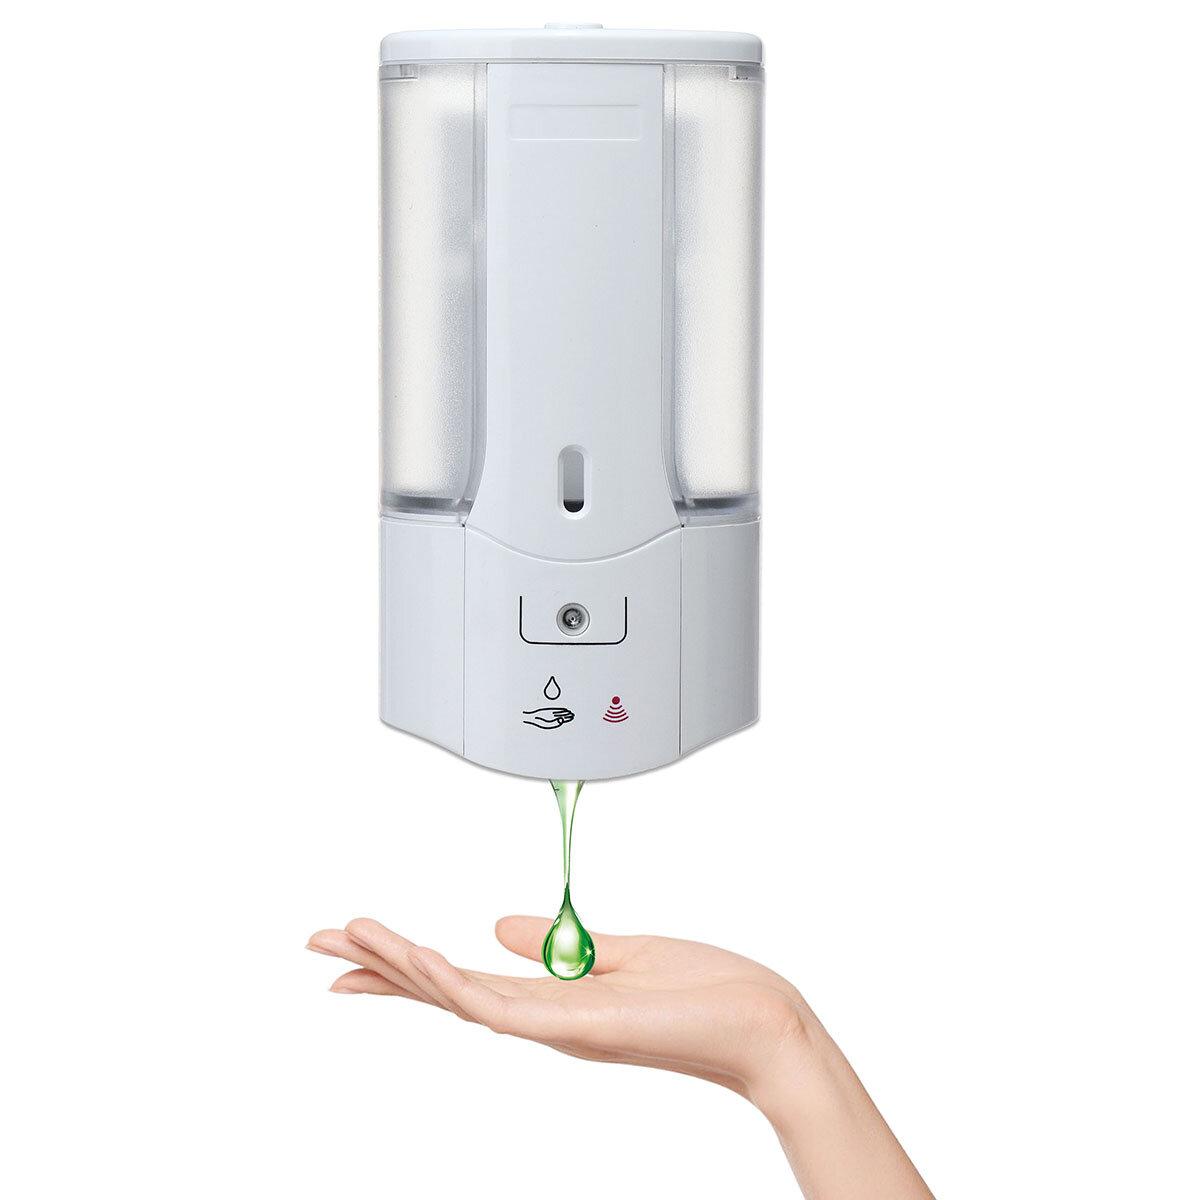 500ml Automatic Sensor Hand Free Soap Dispenser Shampoo Bathroom Wall Mounted Liquid Dispenser Sale Banggood Com